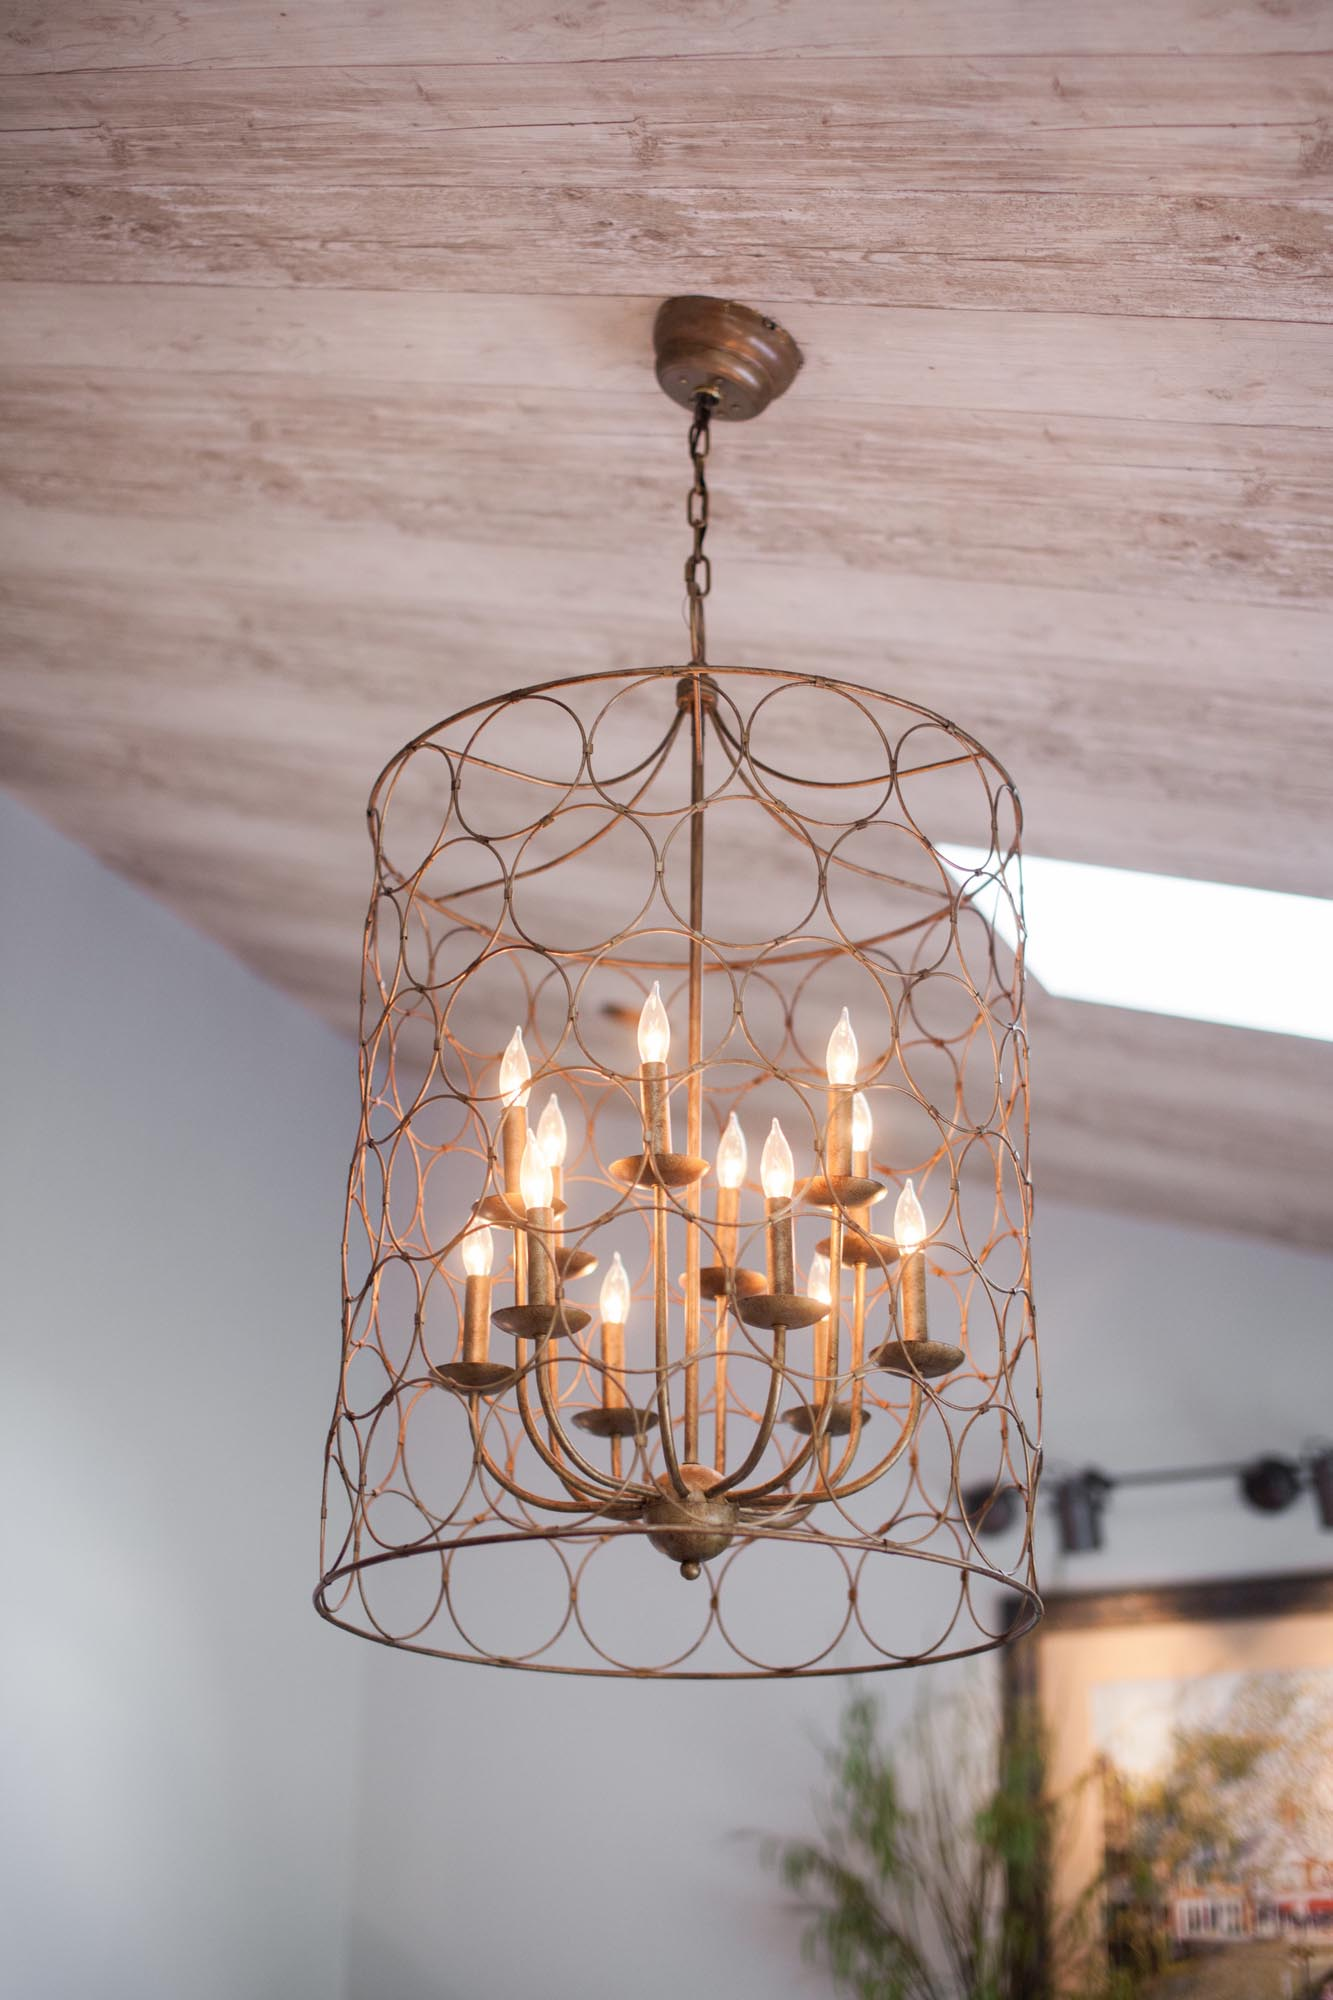 Brass hanging chandelier light fixture